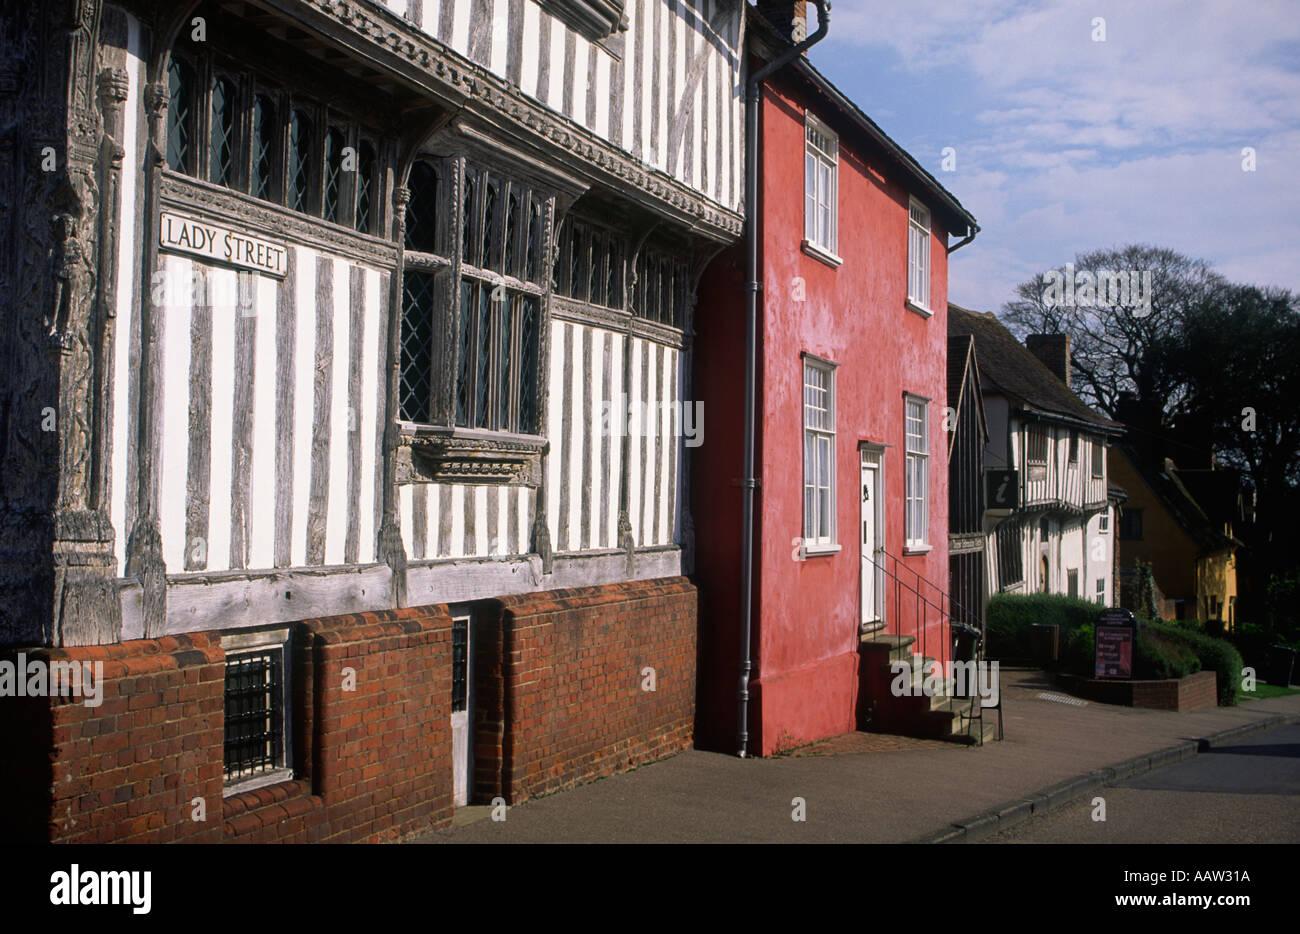 Lady Street Lavenham Suffolk England - Stock Image